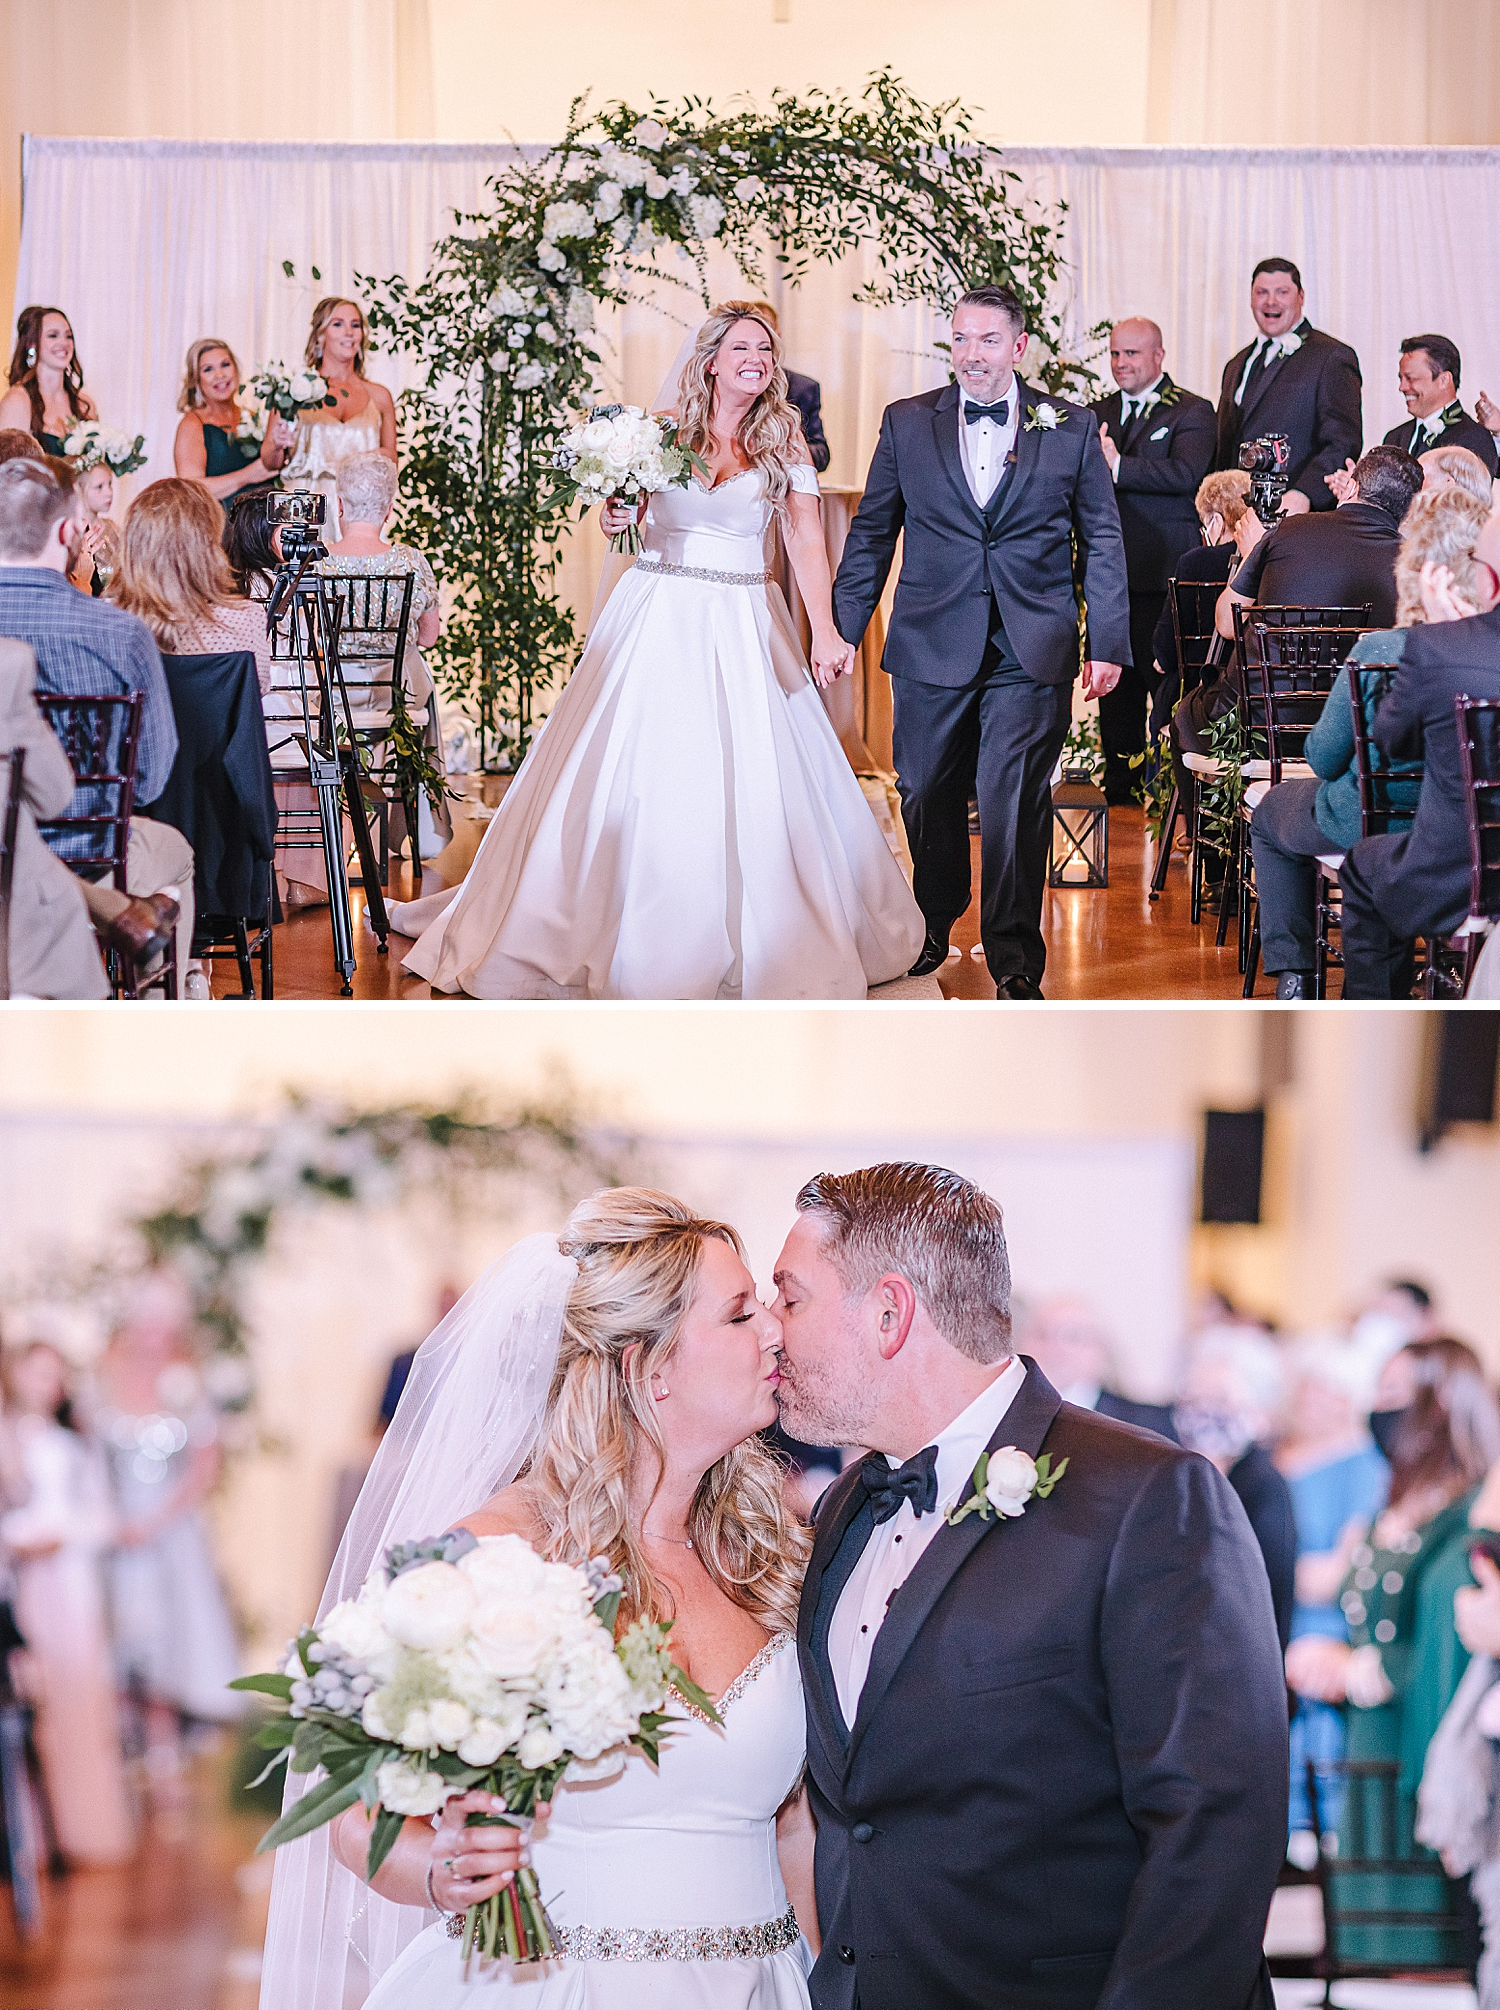 Magnolia-Halle-Wedding-San-Antonio-Texas-Bride-Grom_0061.jpg